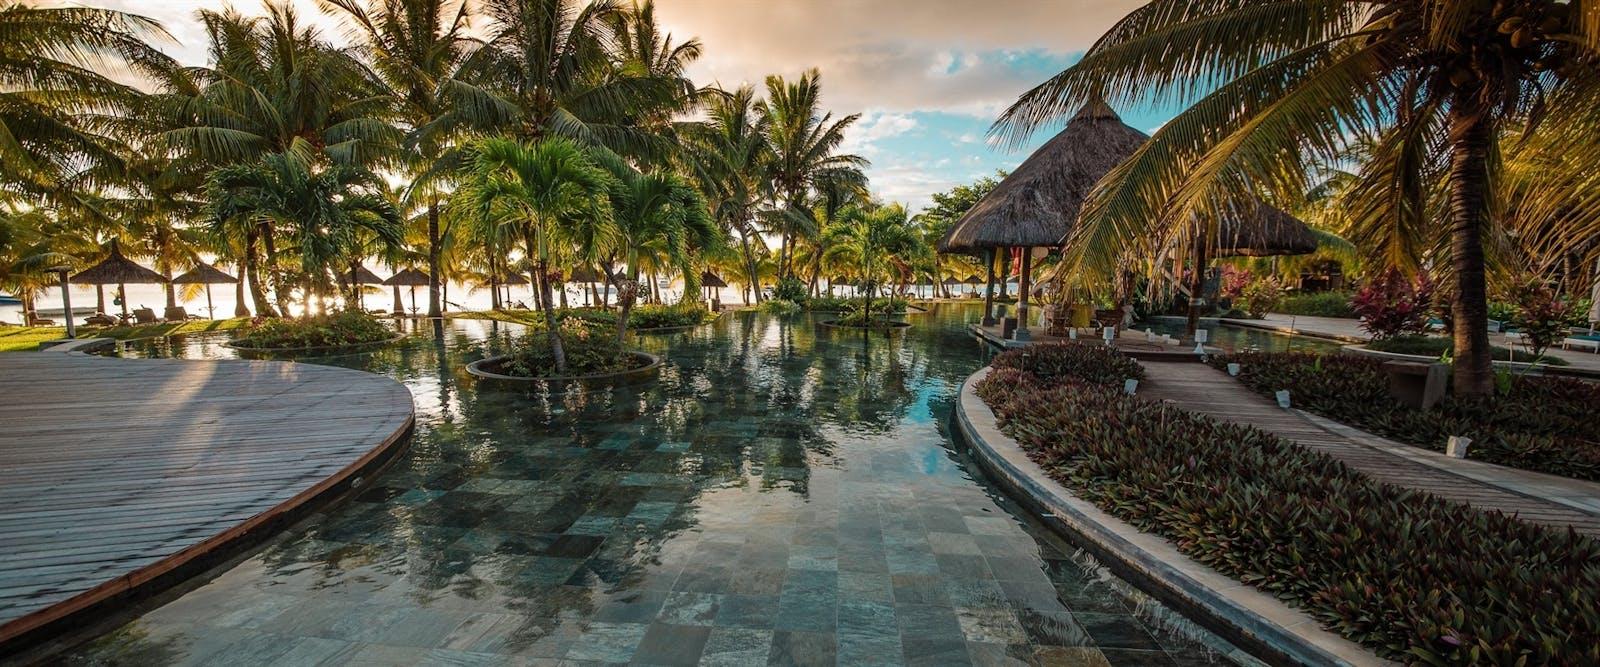 Lux Le Morne Mauritius World Renowned Luxury Hotel Afrika Et Tour Horseback Riding 12 Oasis Pool At